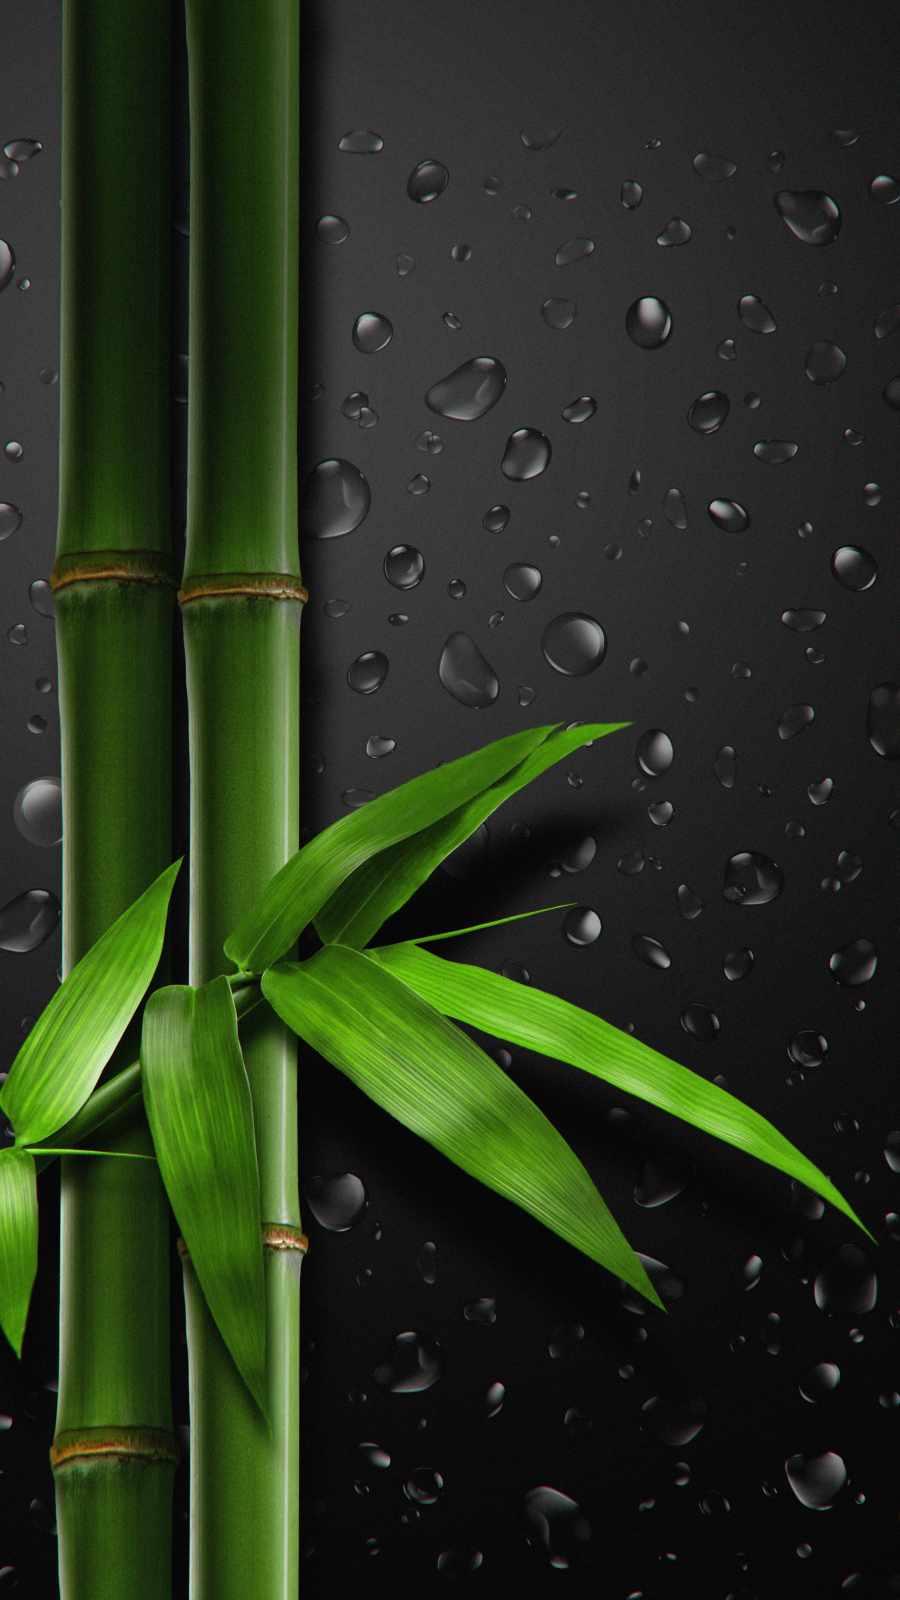 Bamboo Tree iPhone Wallpaper